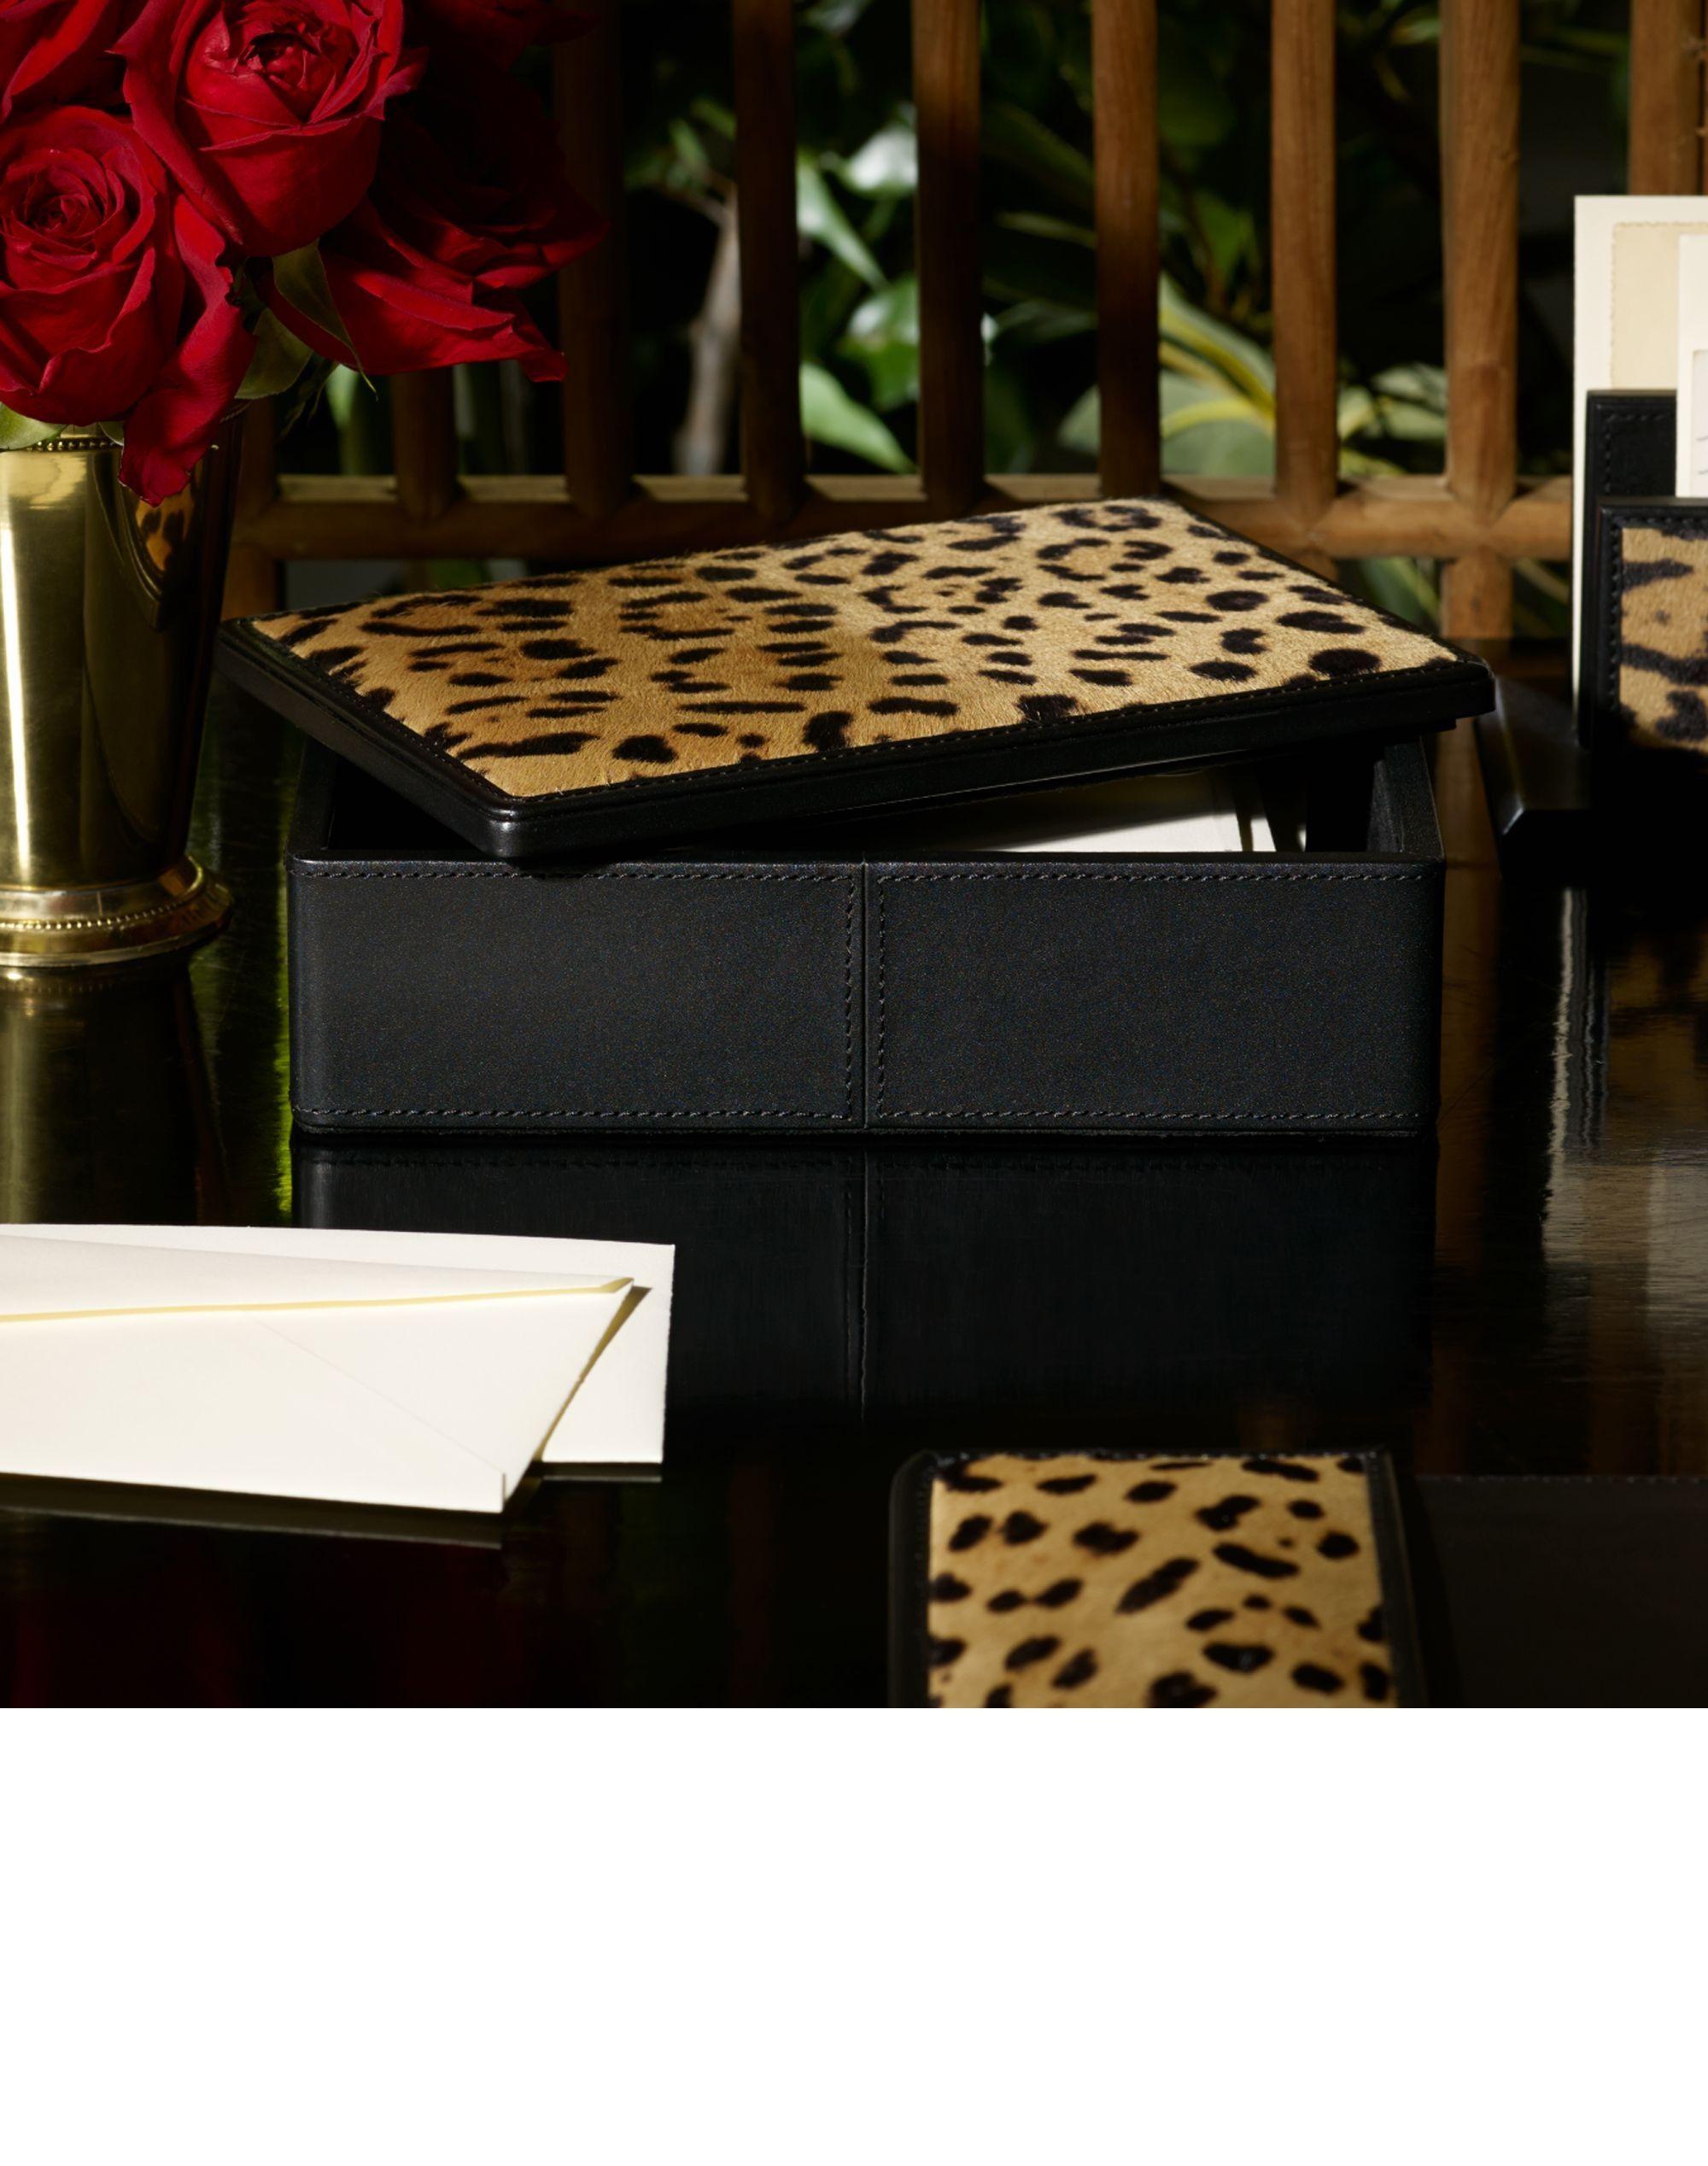 luxury office desk accessories. InStyle-Decor.com Luxury Desk Accessories, Pads, Blotters, Office Accessories